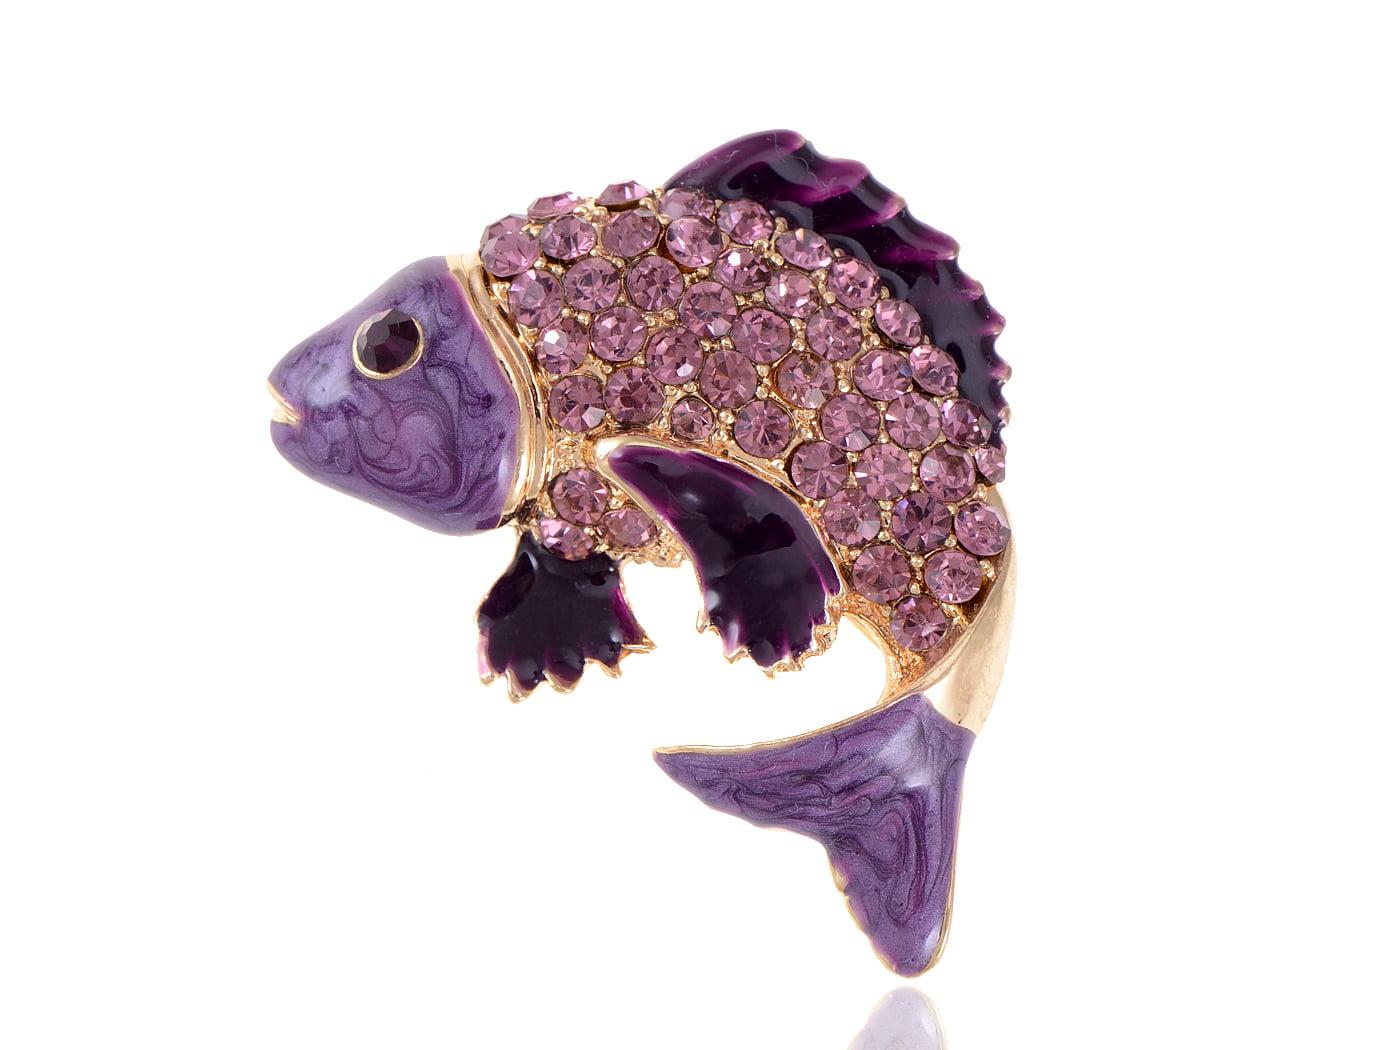 Alilang Koi Fish Pin Brooch Golden Tone Enamel With Aqua Blue, Green Or Purpl... by